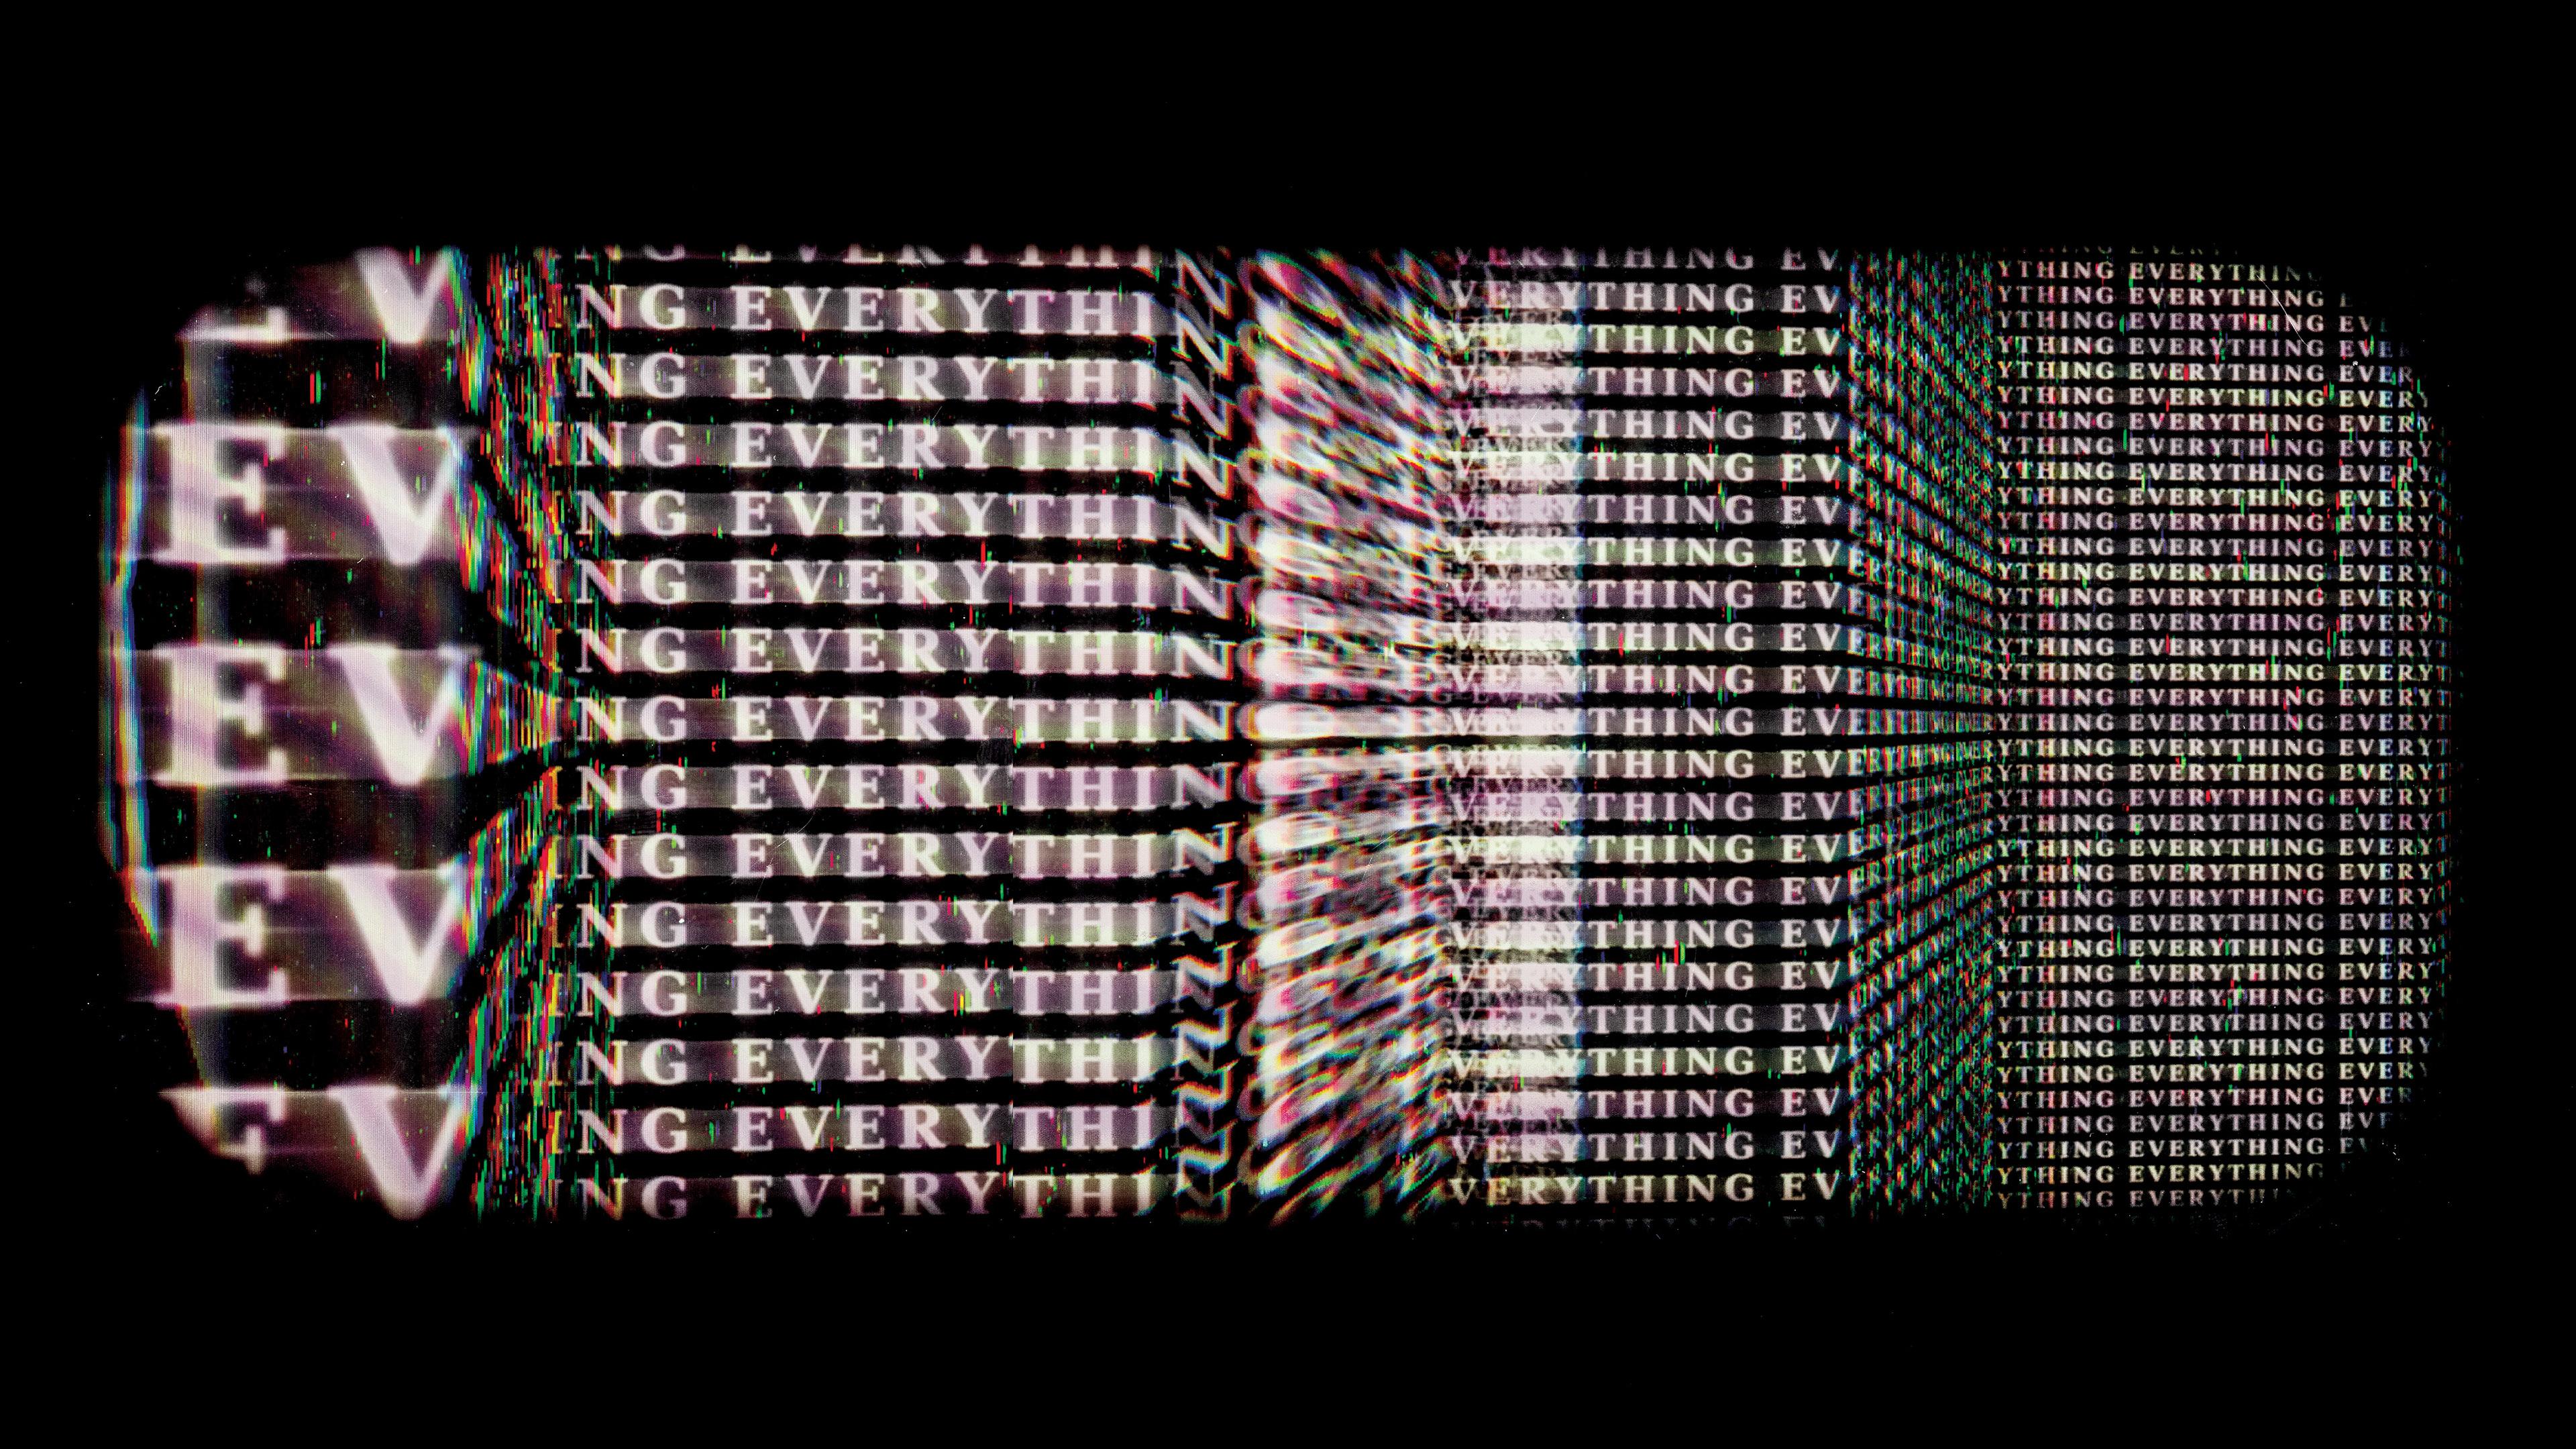 EVERYTHING EVERYTHING EVERYTHING